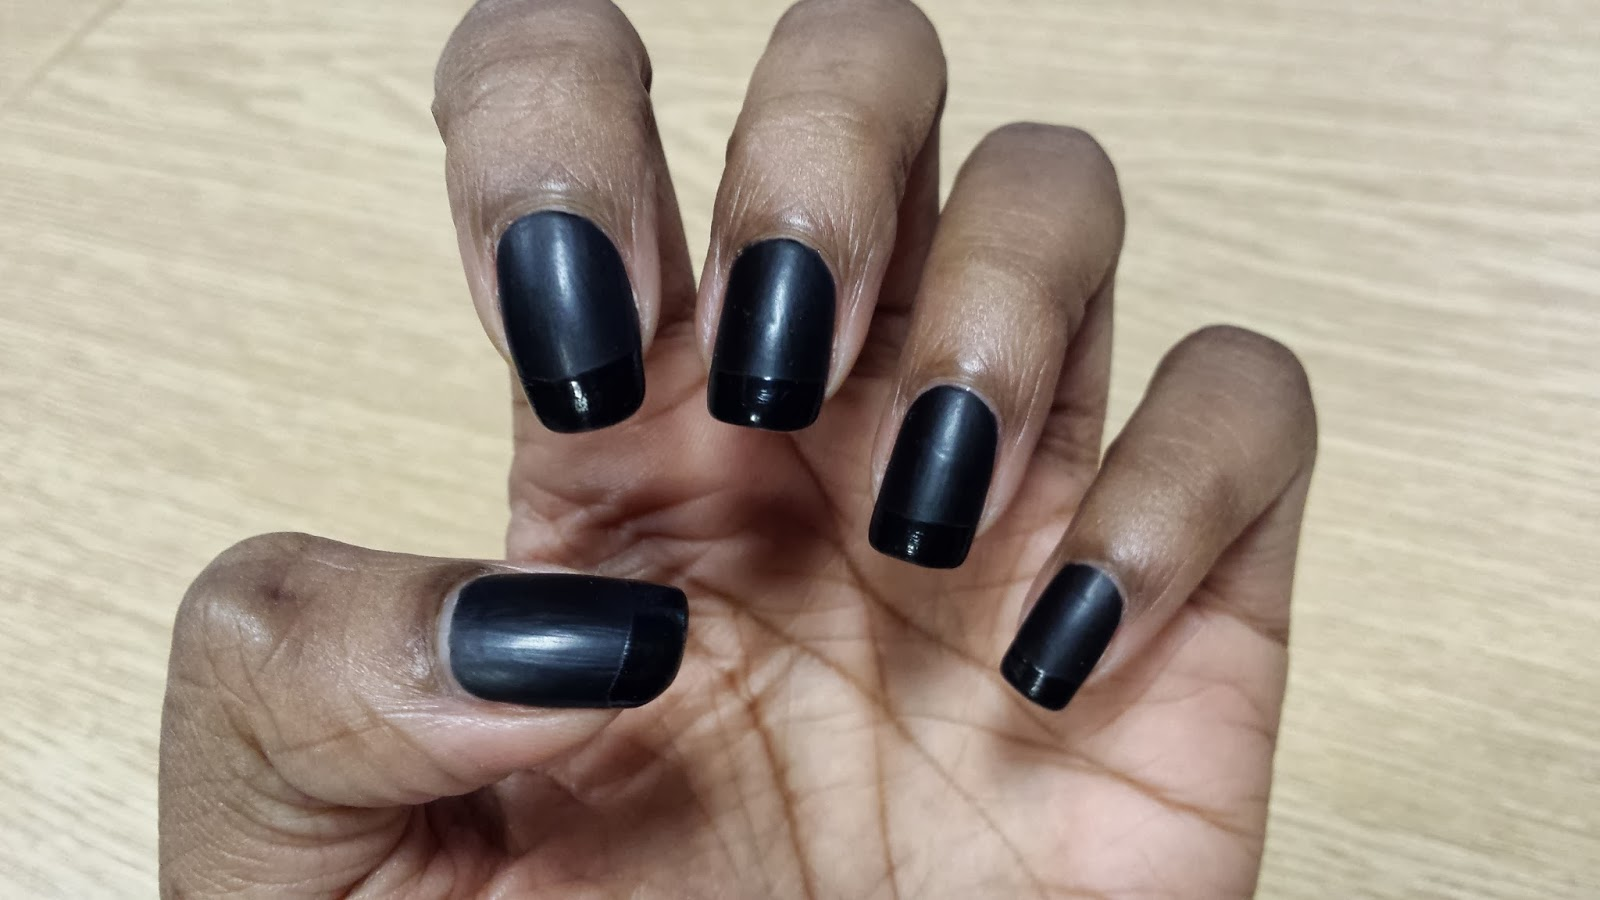 ArtzeeNailz: Matte Black & Glossy Tips